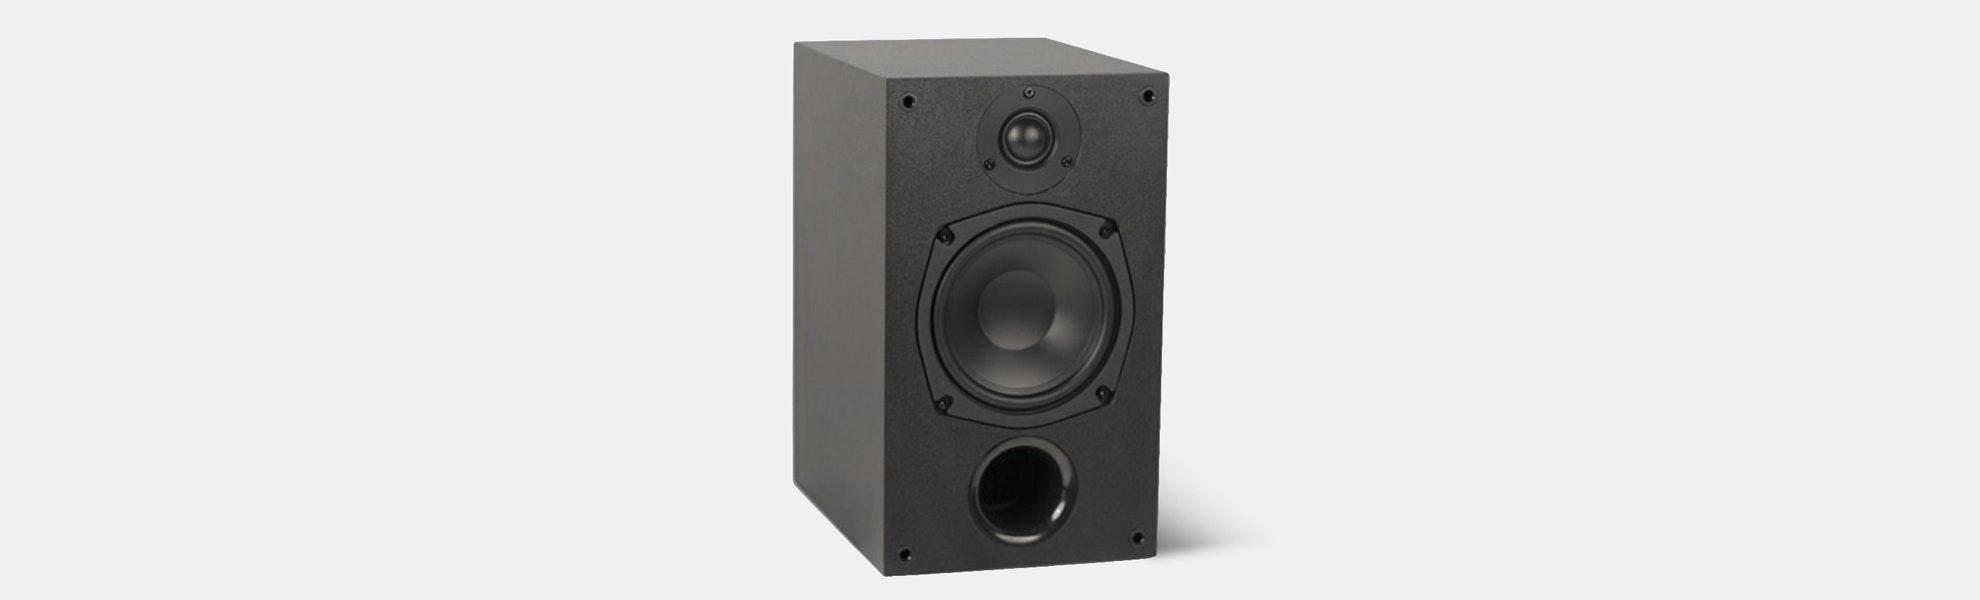 Wavecrest Audio HVL-1 Two-Way Loudspeaker